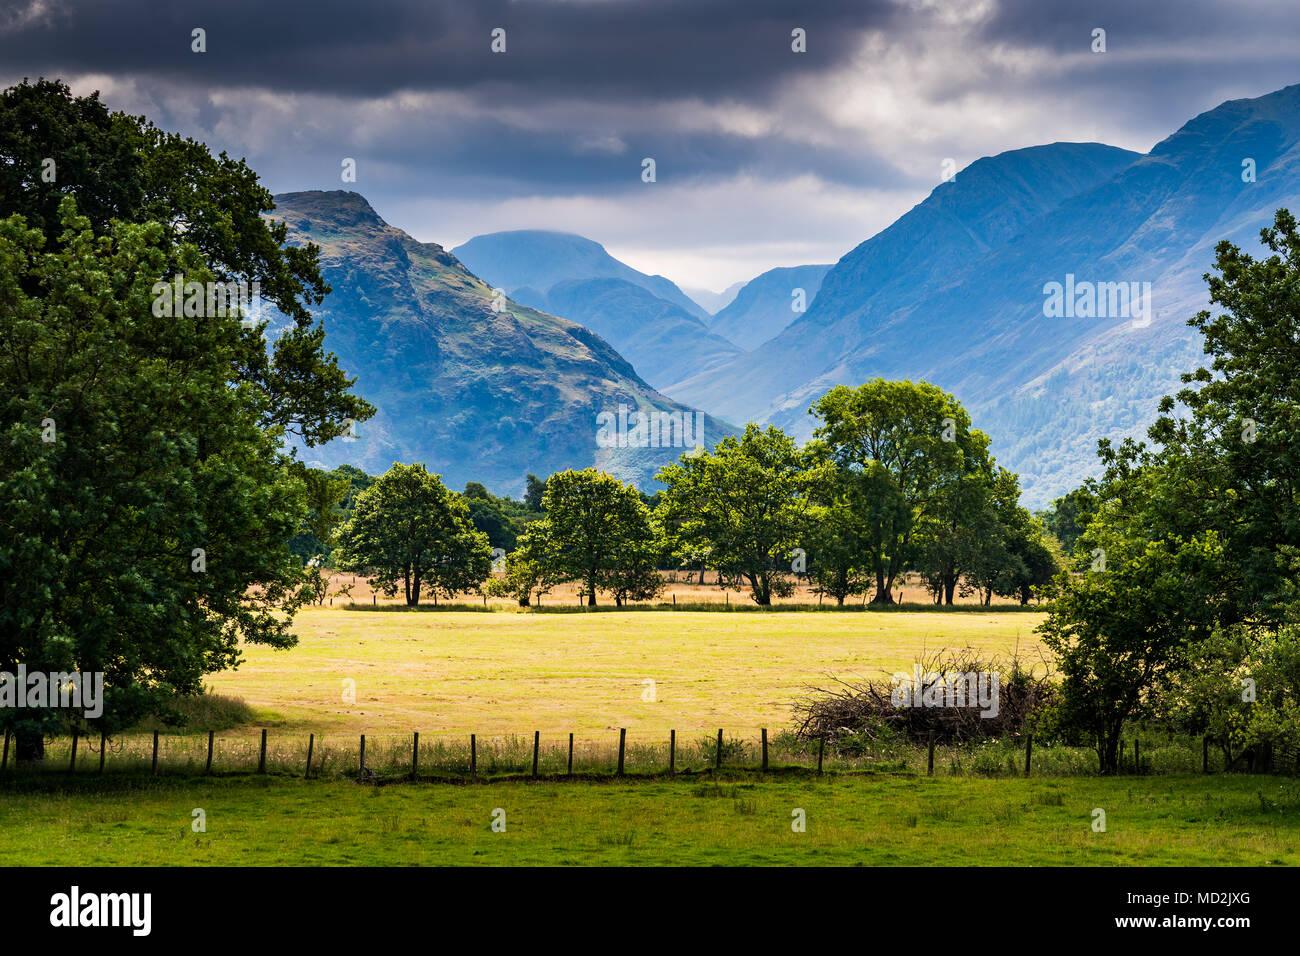 Near Gillerthwaite 2, The Lake District, UK. - Stock Image